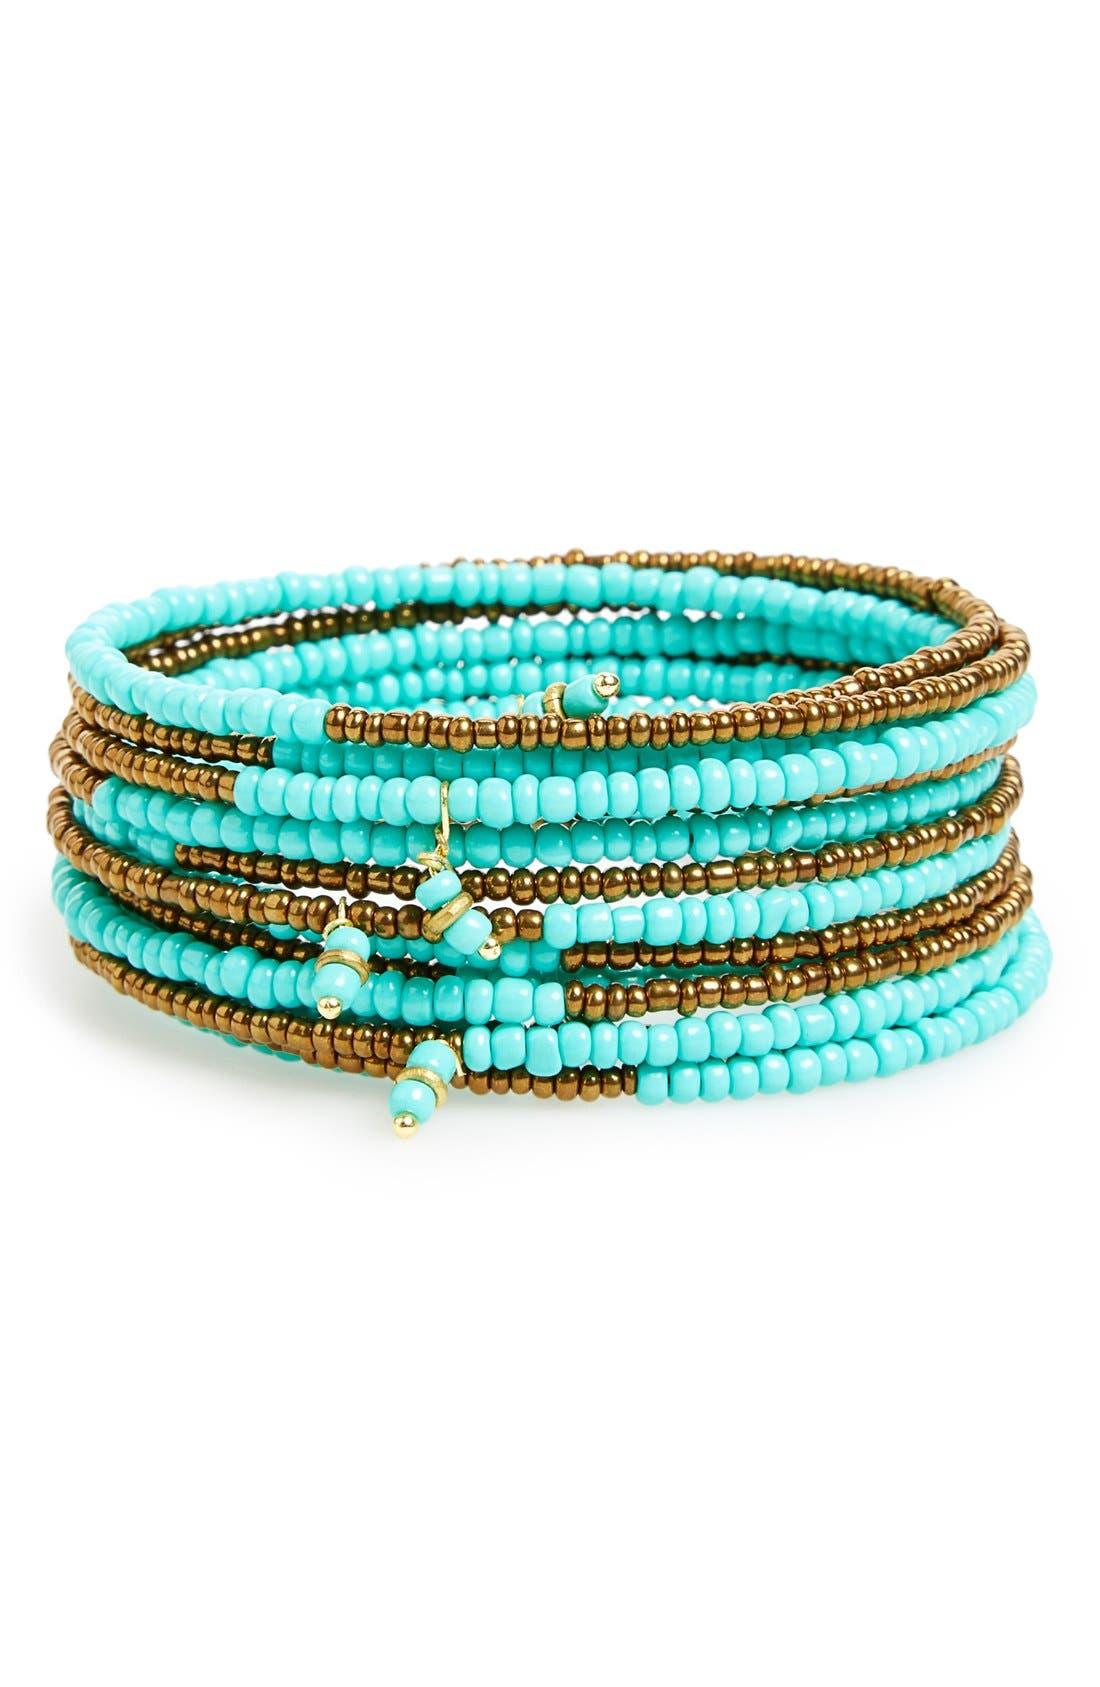 Main Image - Me to We Artisans 'Kitanzi' Beaded Bracelet